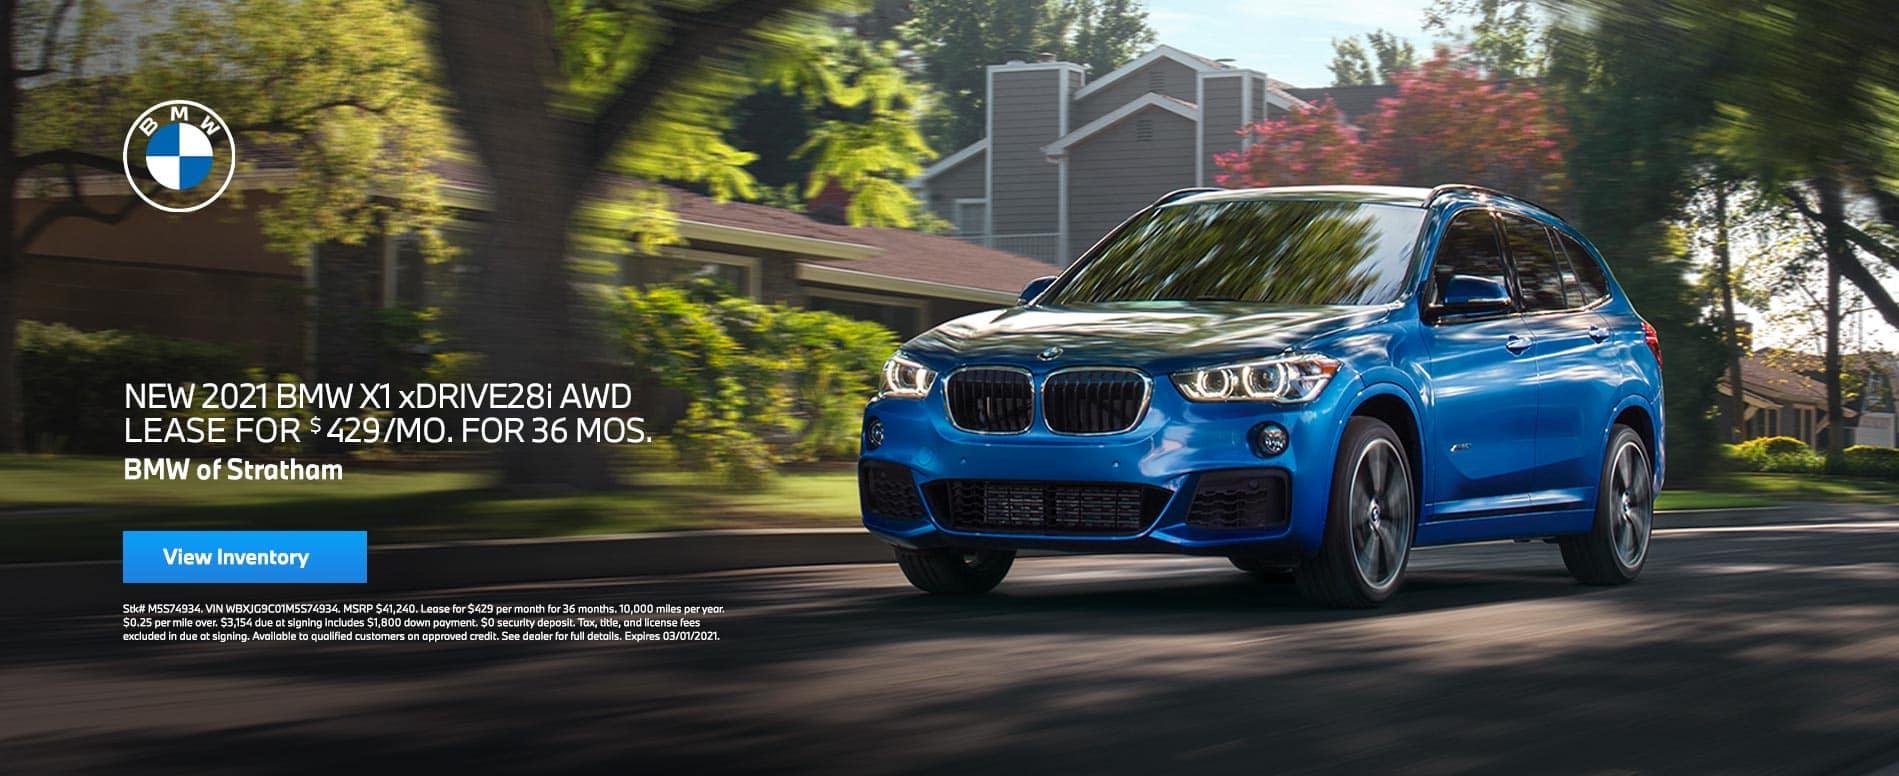 BMWStratham_Slide_1990x776_X1_2-2021